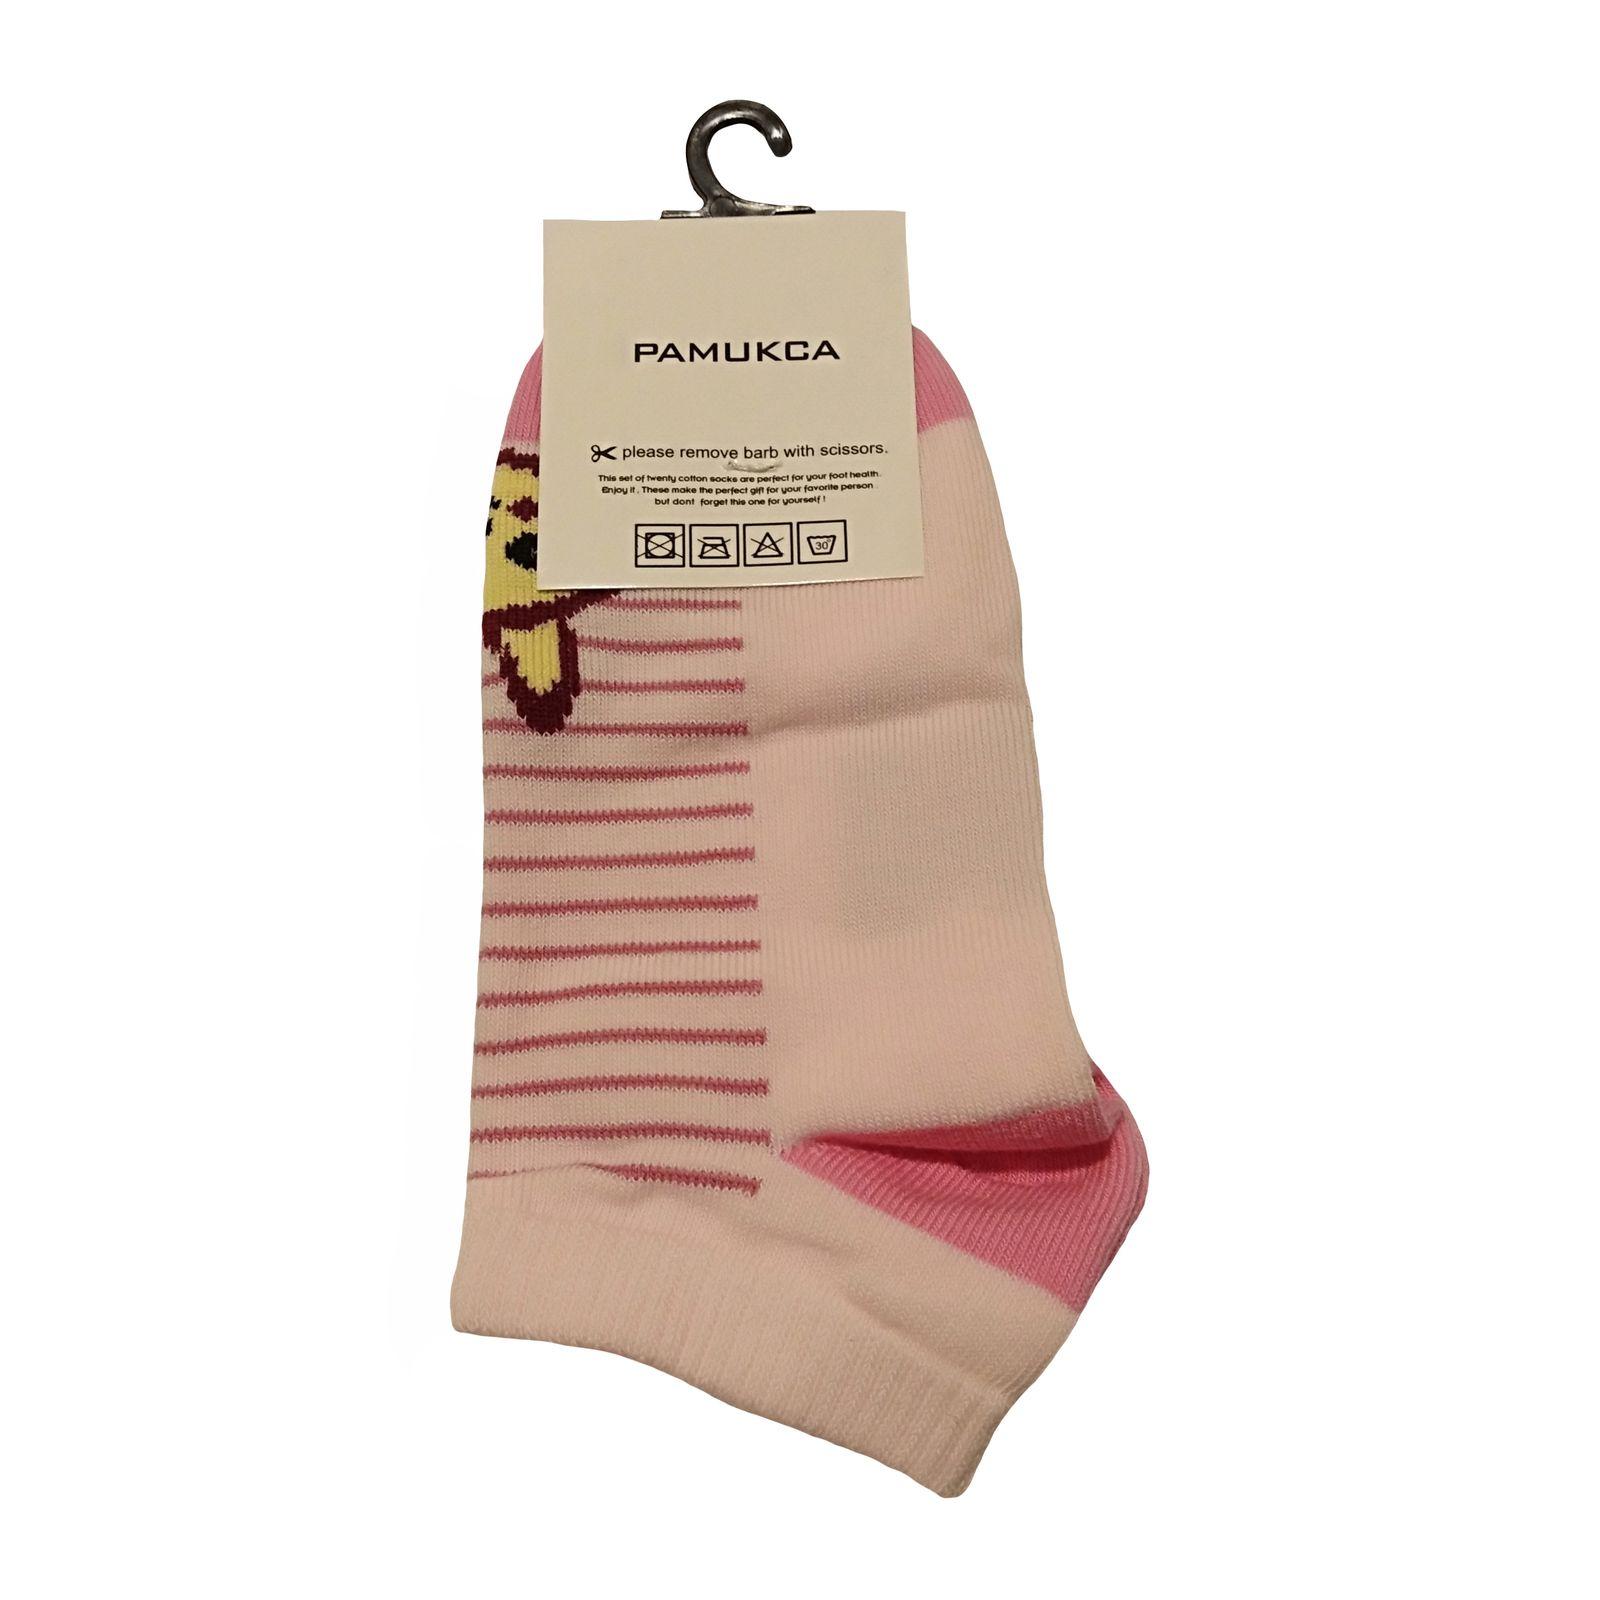 جوراب بچگانه پاموکا مدل A-6 -  - 3